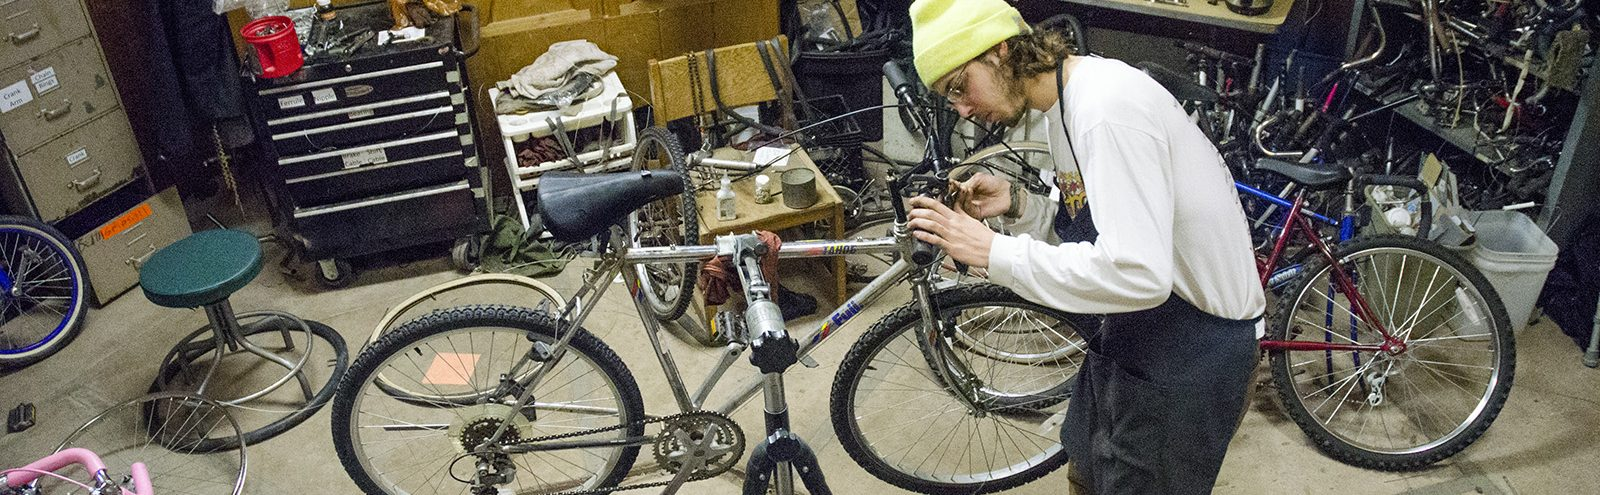 Northland College student working on bike.